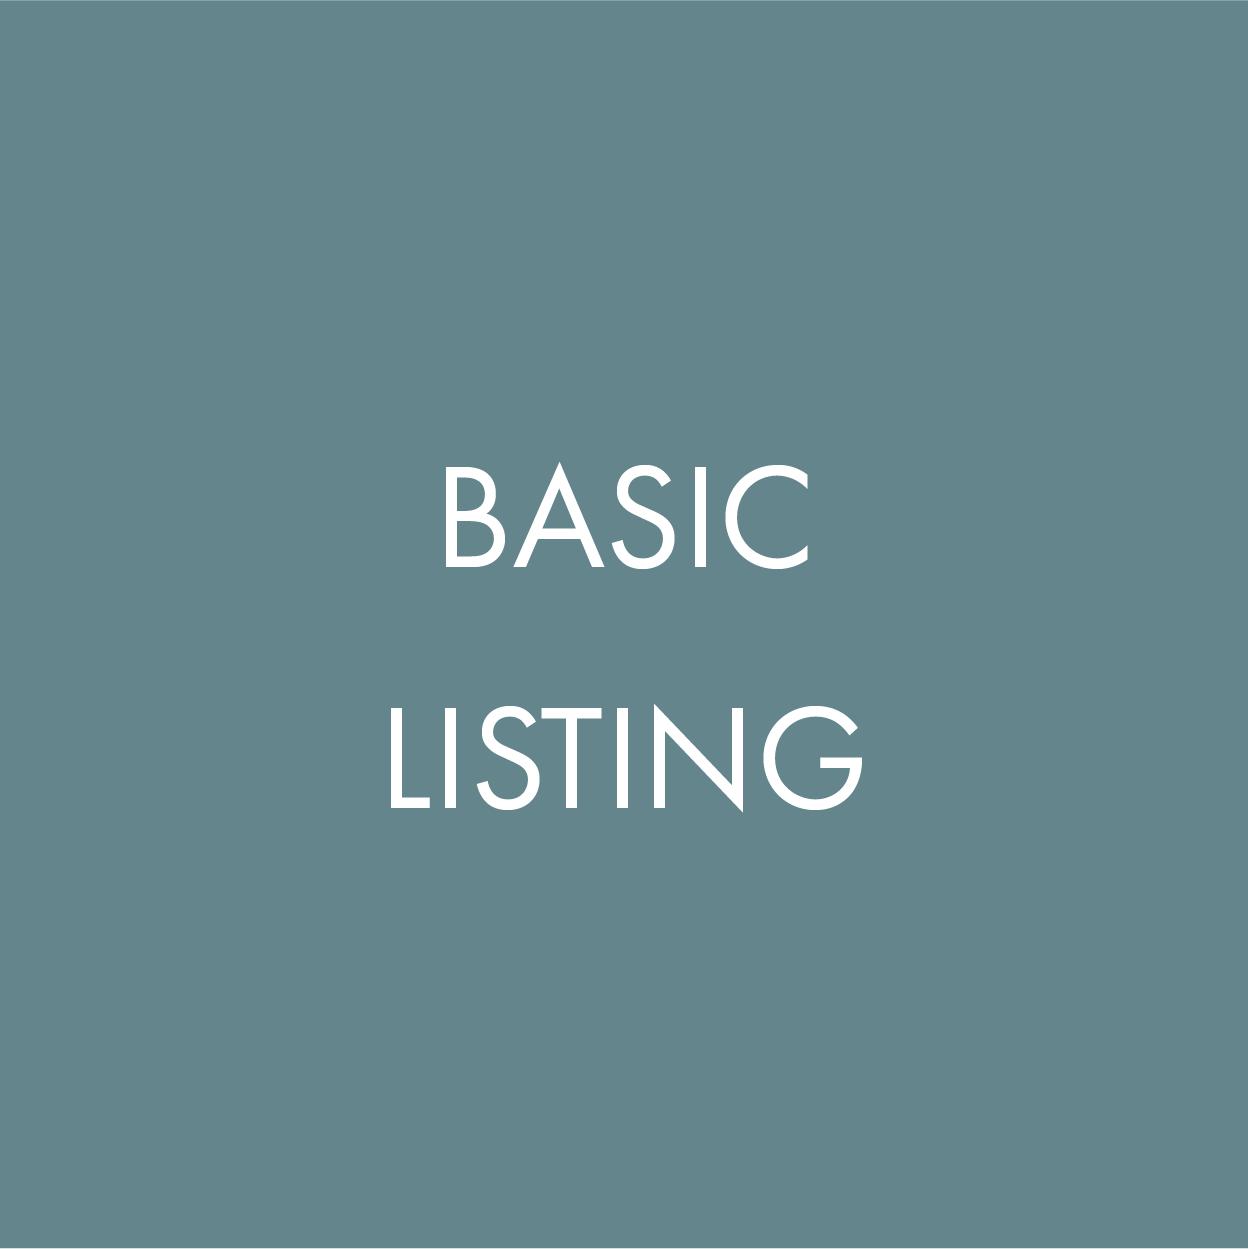 BASIC LISTING -       96       Normal  0          false  false  false    EN-US  X-NONE  X-NONE                                                                                                                                                                                                                                                                                                                                                                                                                                                                                                                                                                                                                                                                                                                                                                                                                                                     /* Style Definitions */ table.MsoNormalTable {mso-style-name: